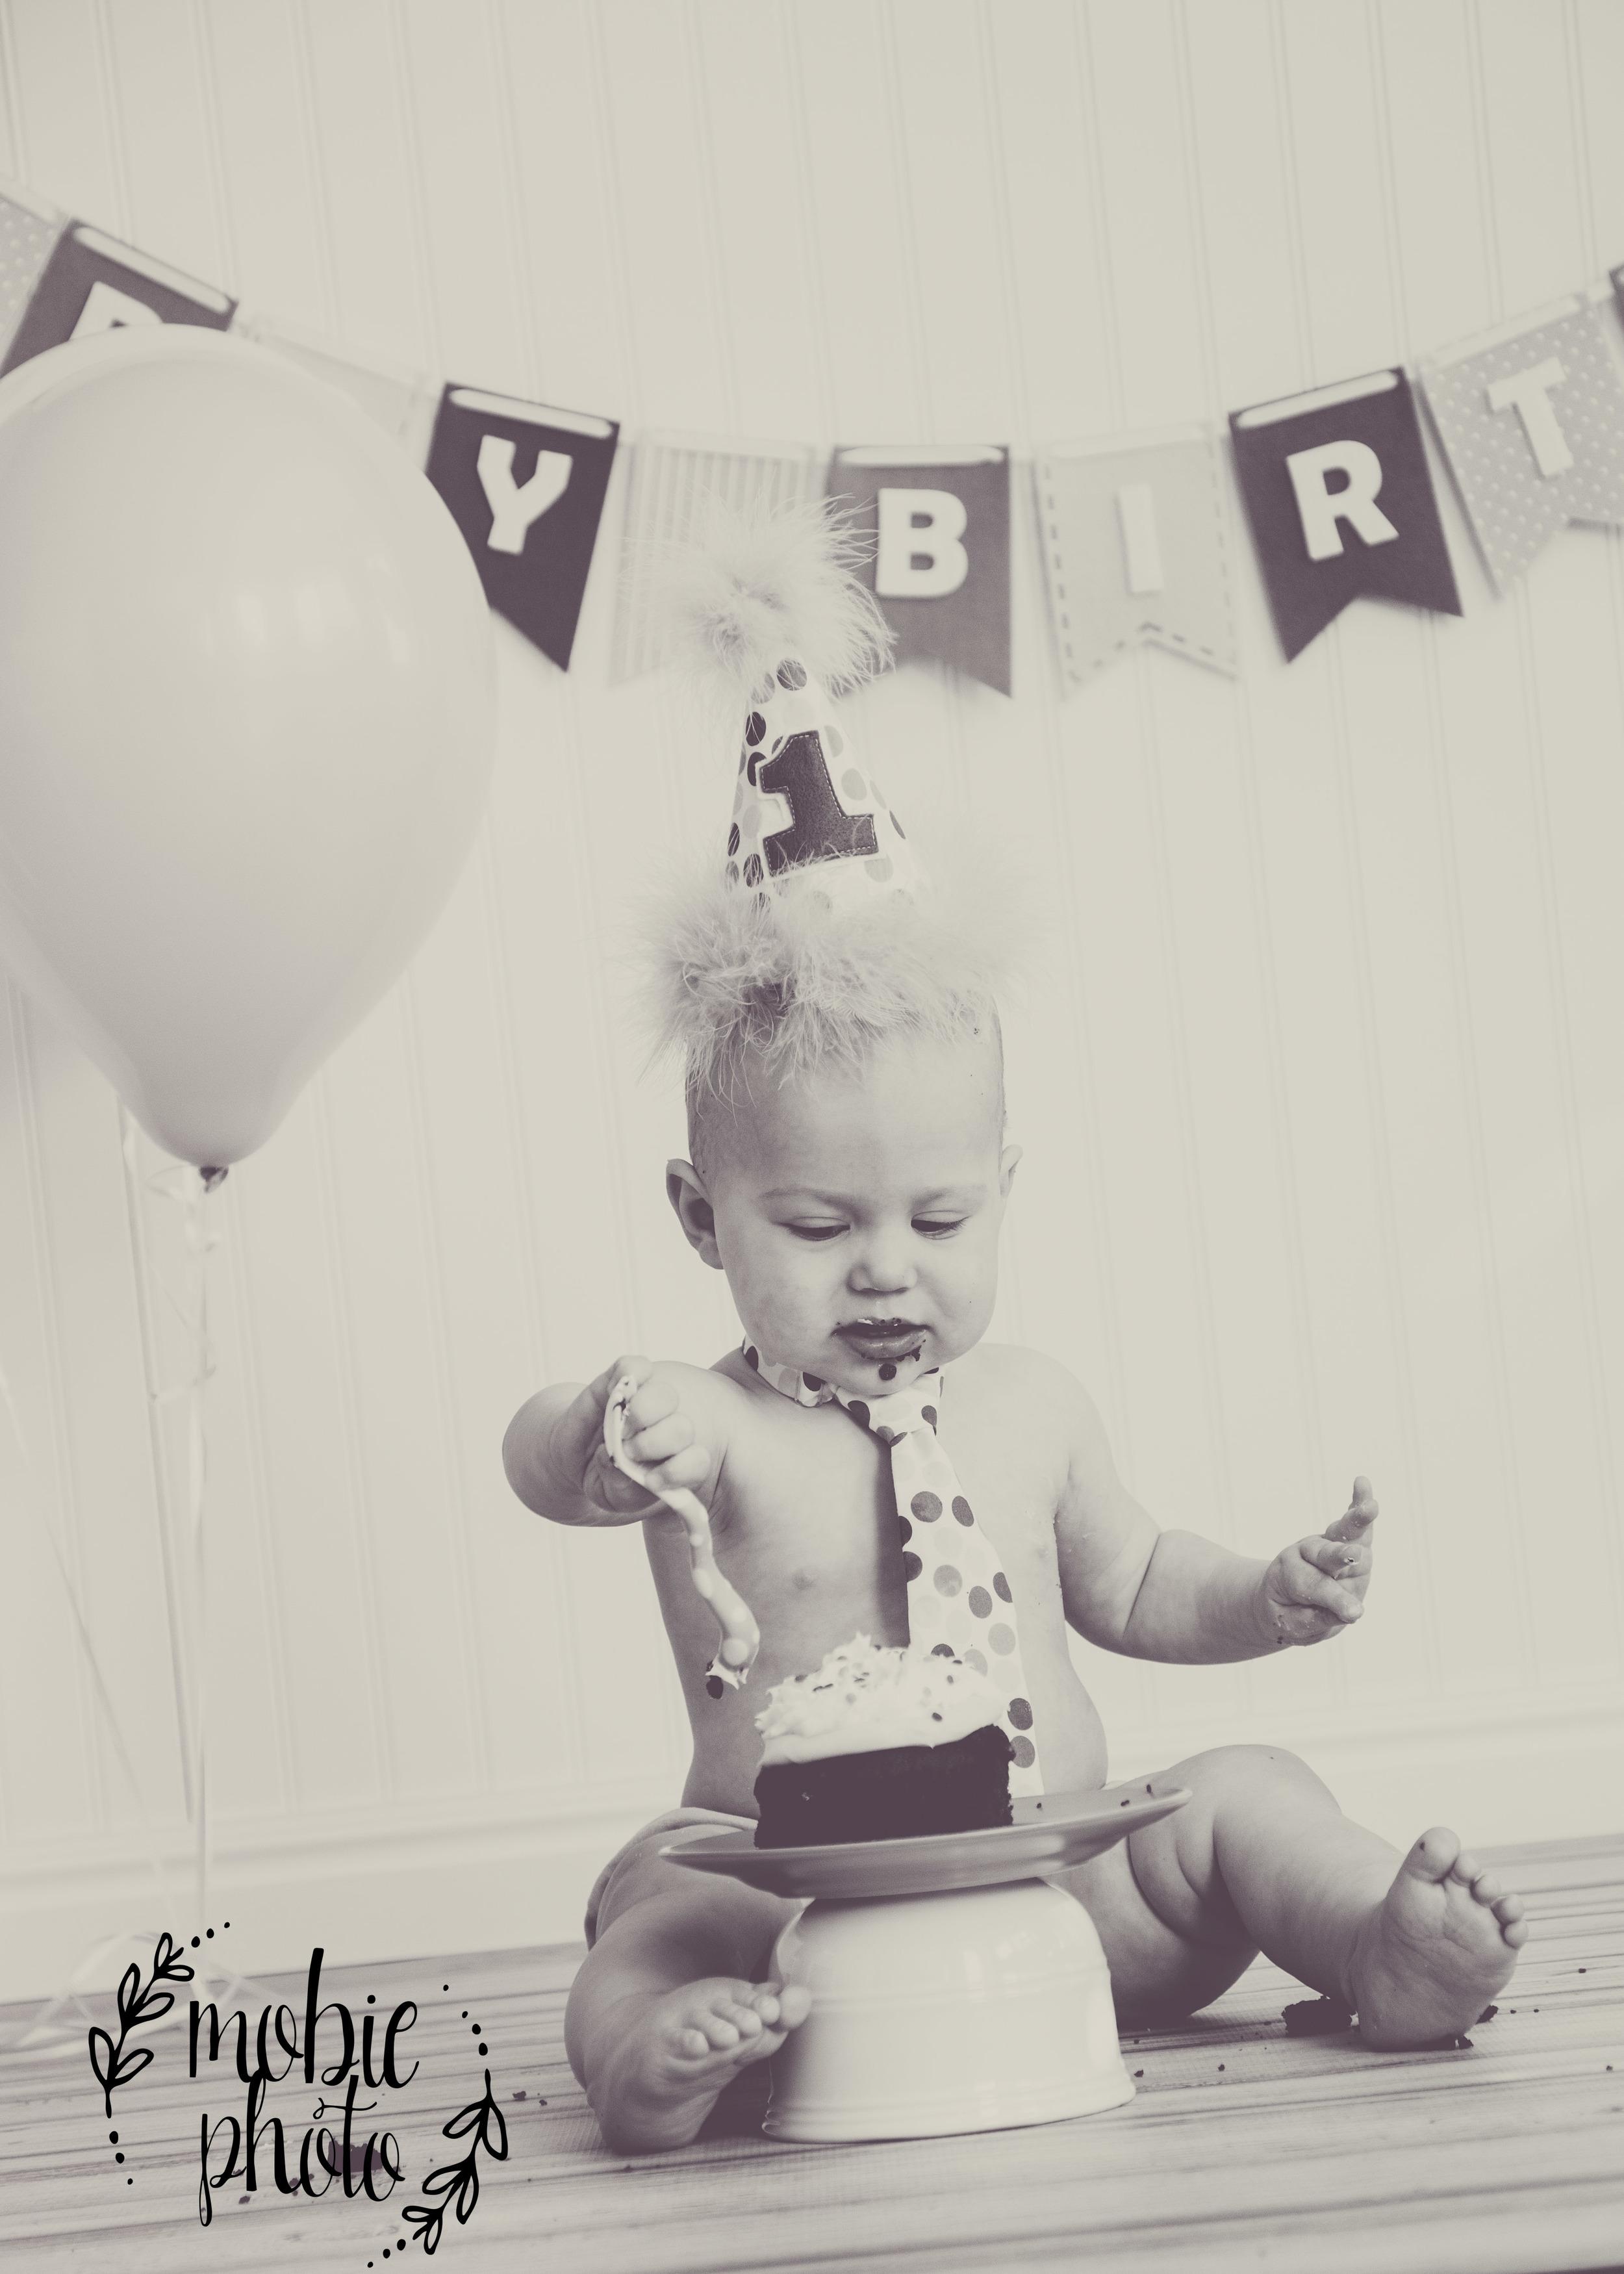 Mobie Photo First Birthday